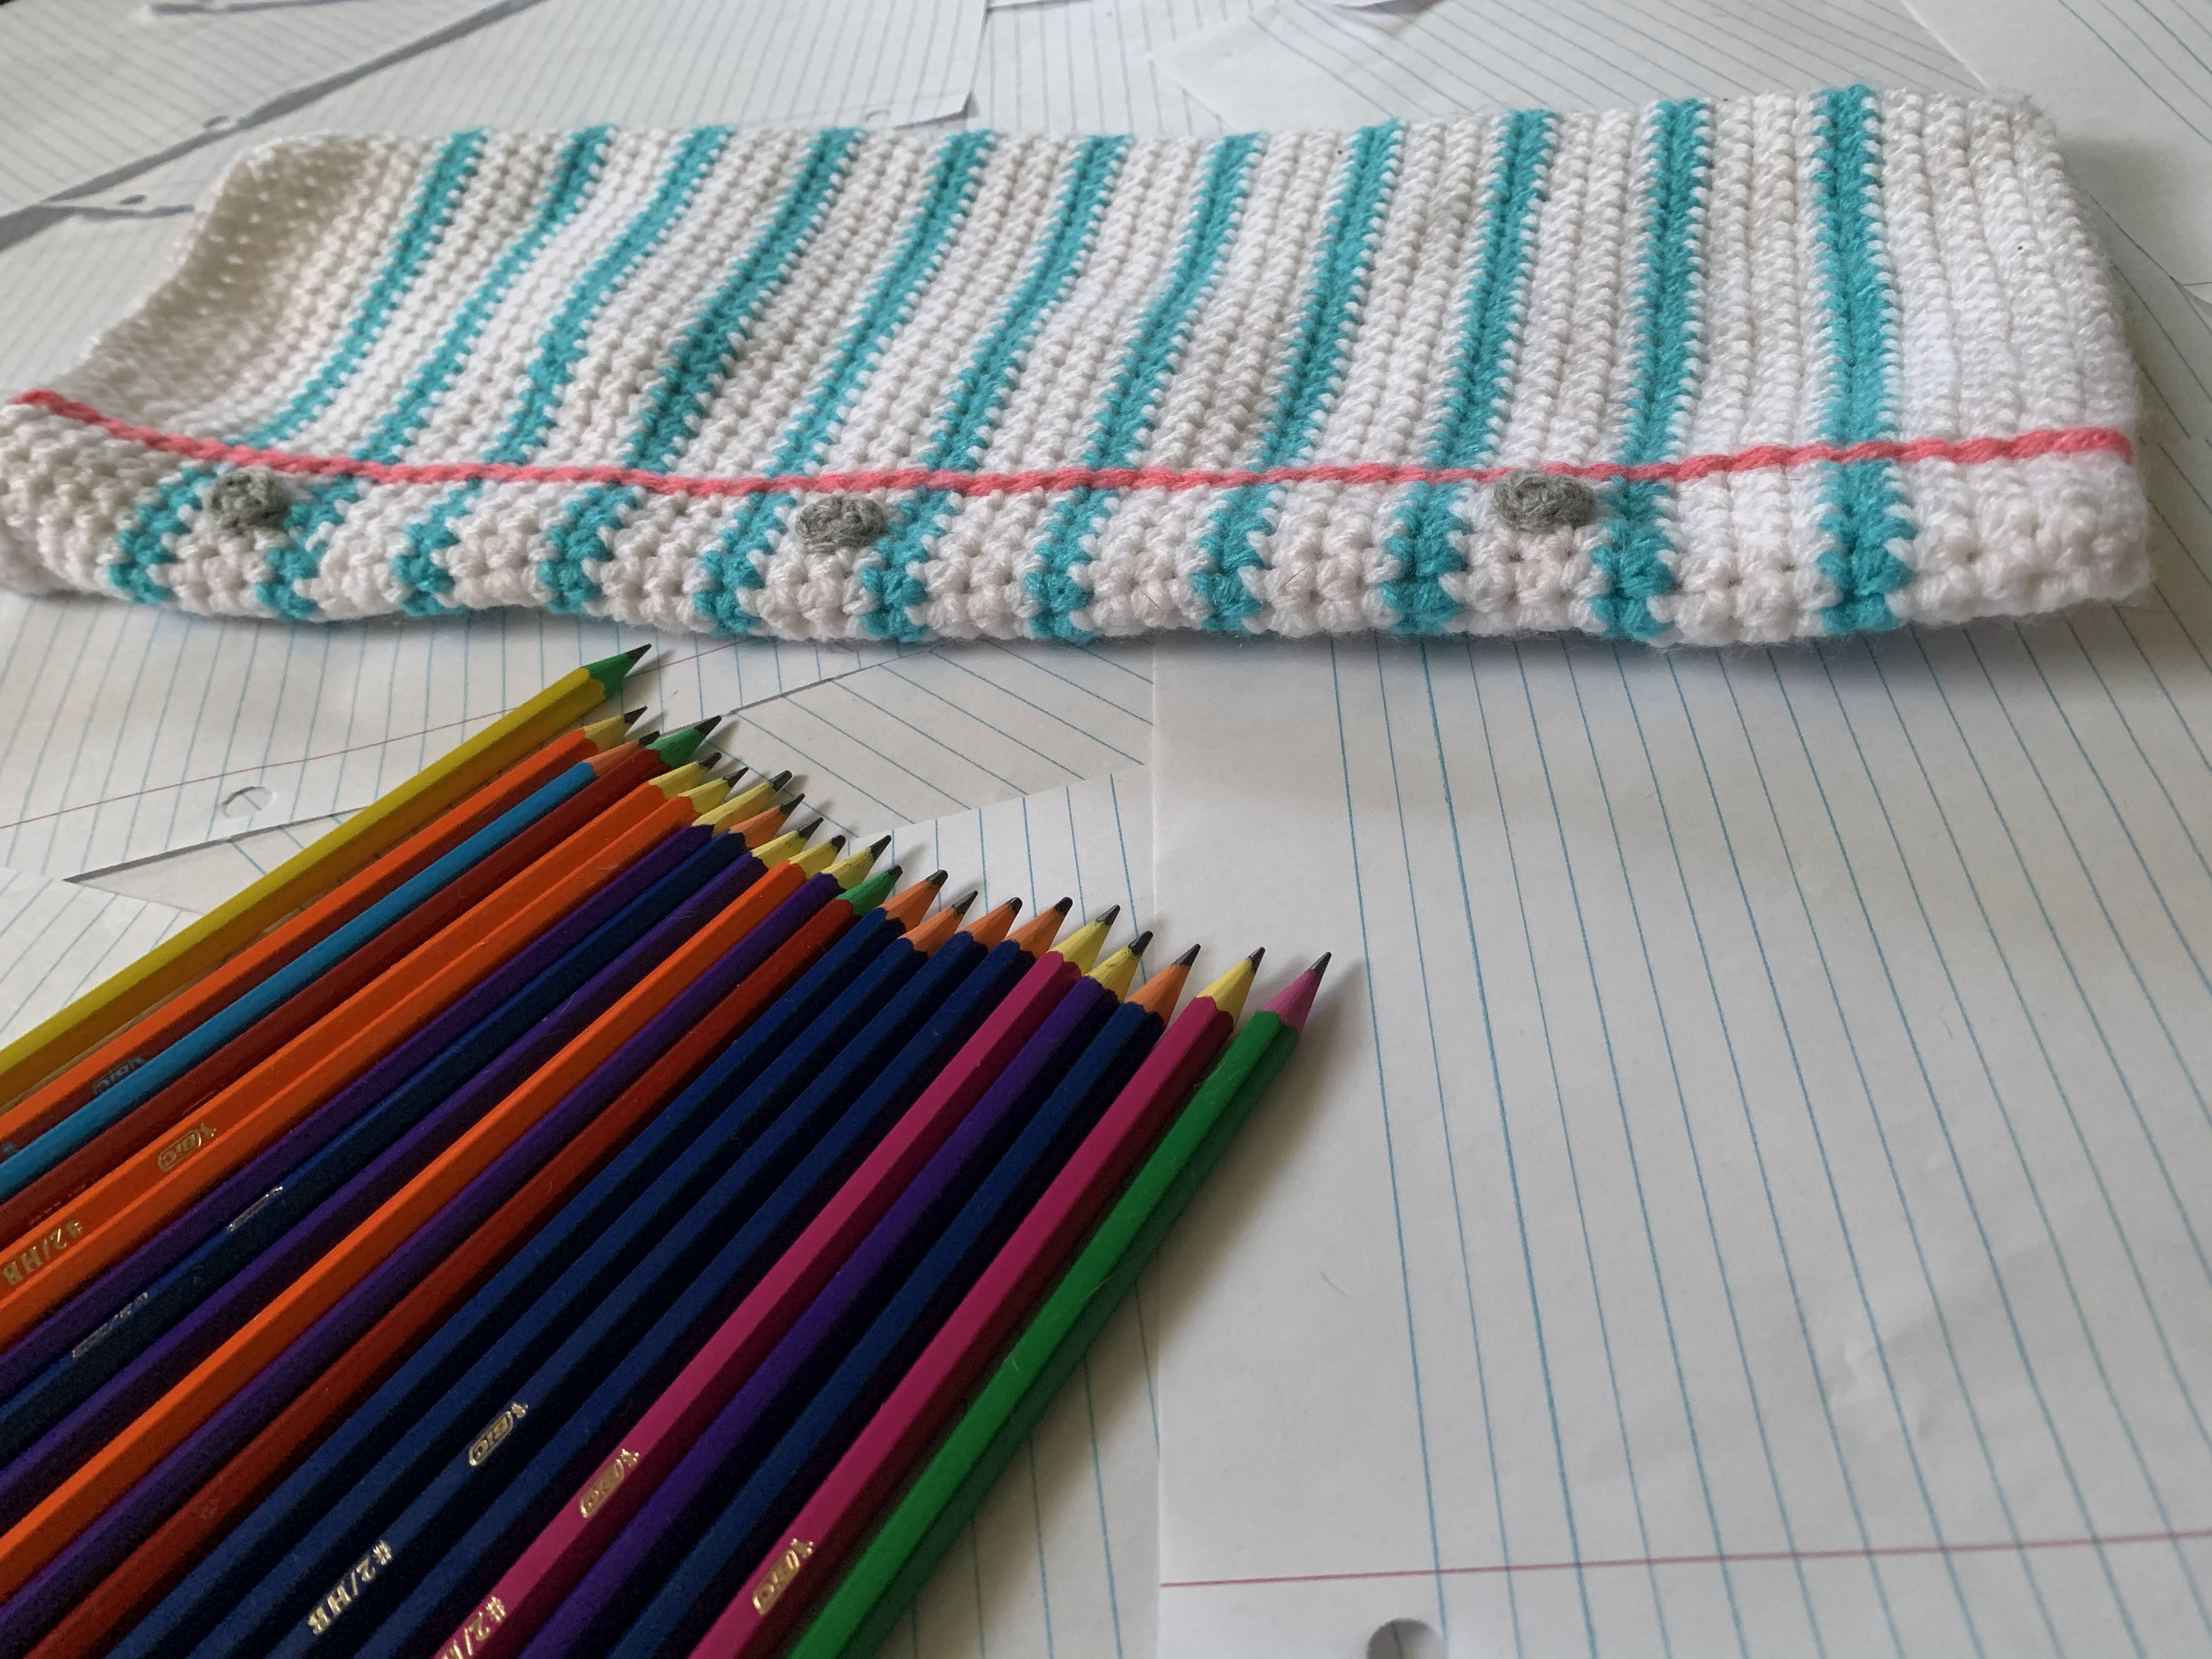 paper, stocking, pencil, Christmas, crochet, school, writer, book, gift, yarn, holiday, bag, white, December, winter, twenty five, time, year